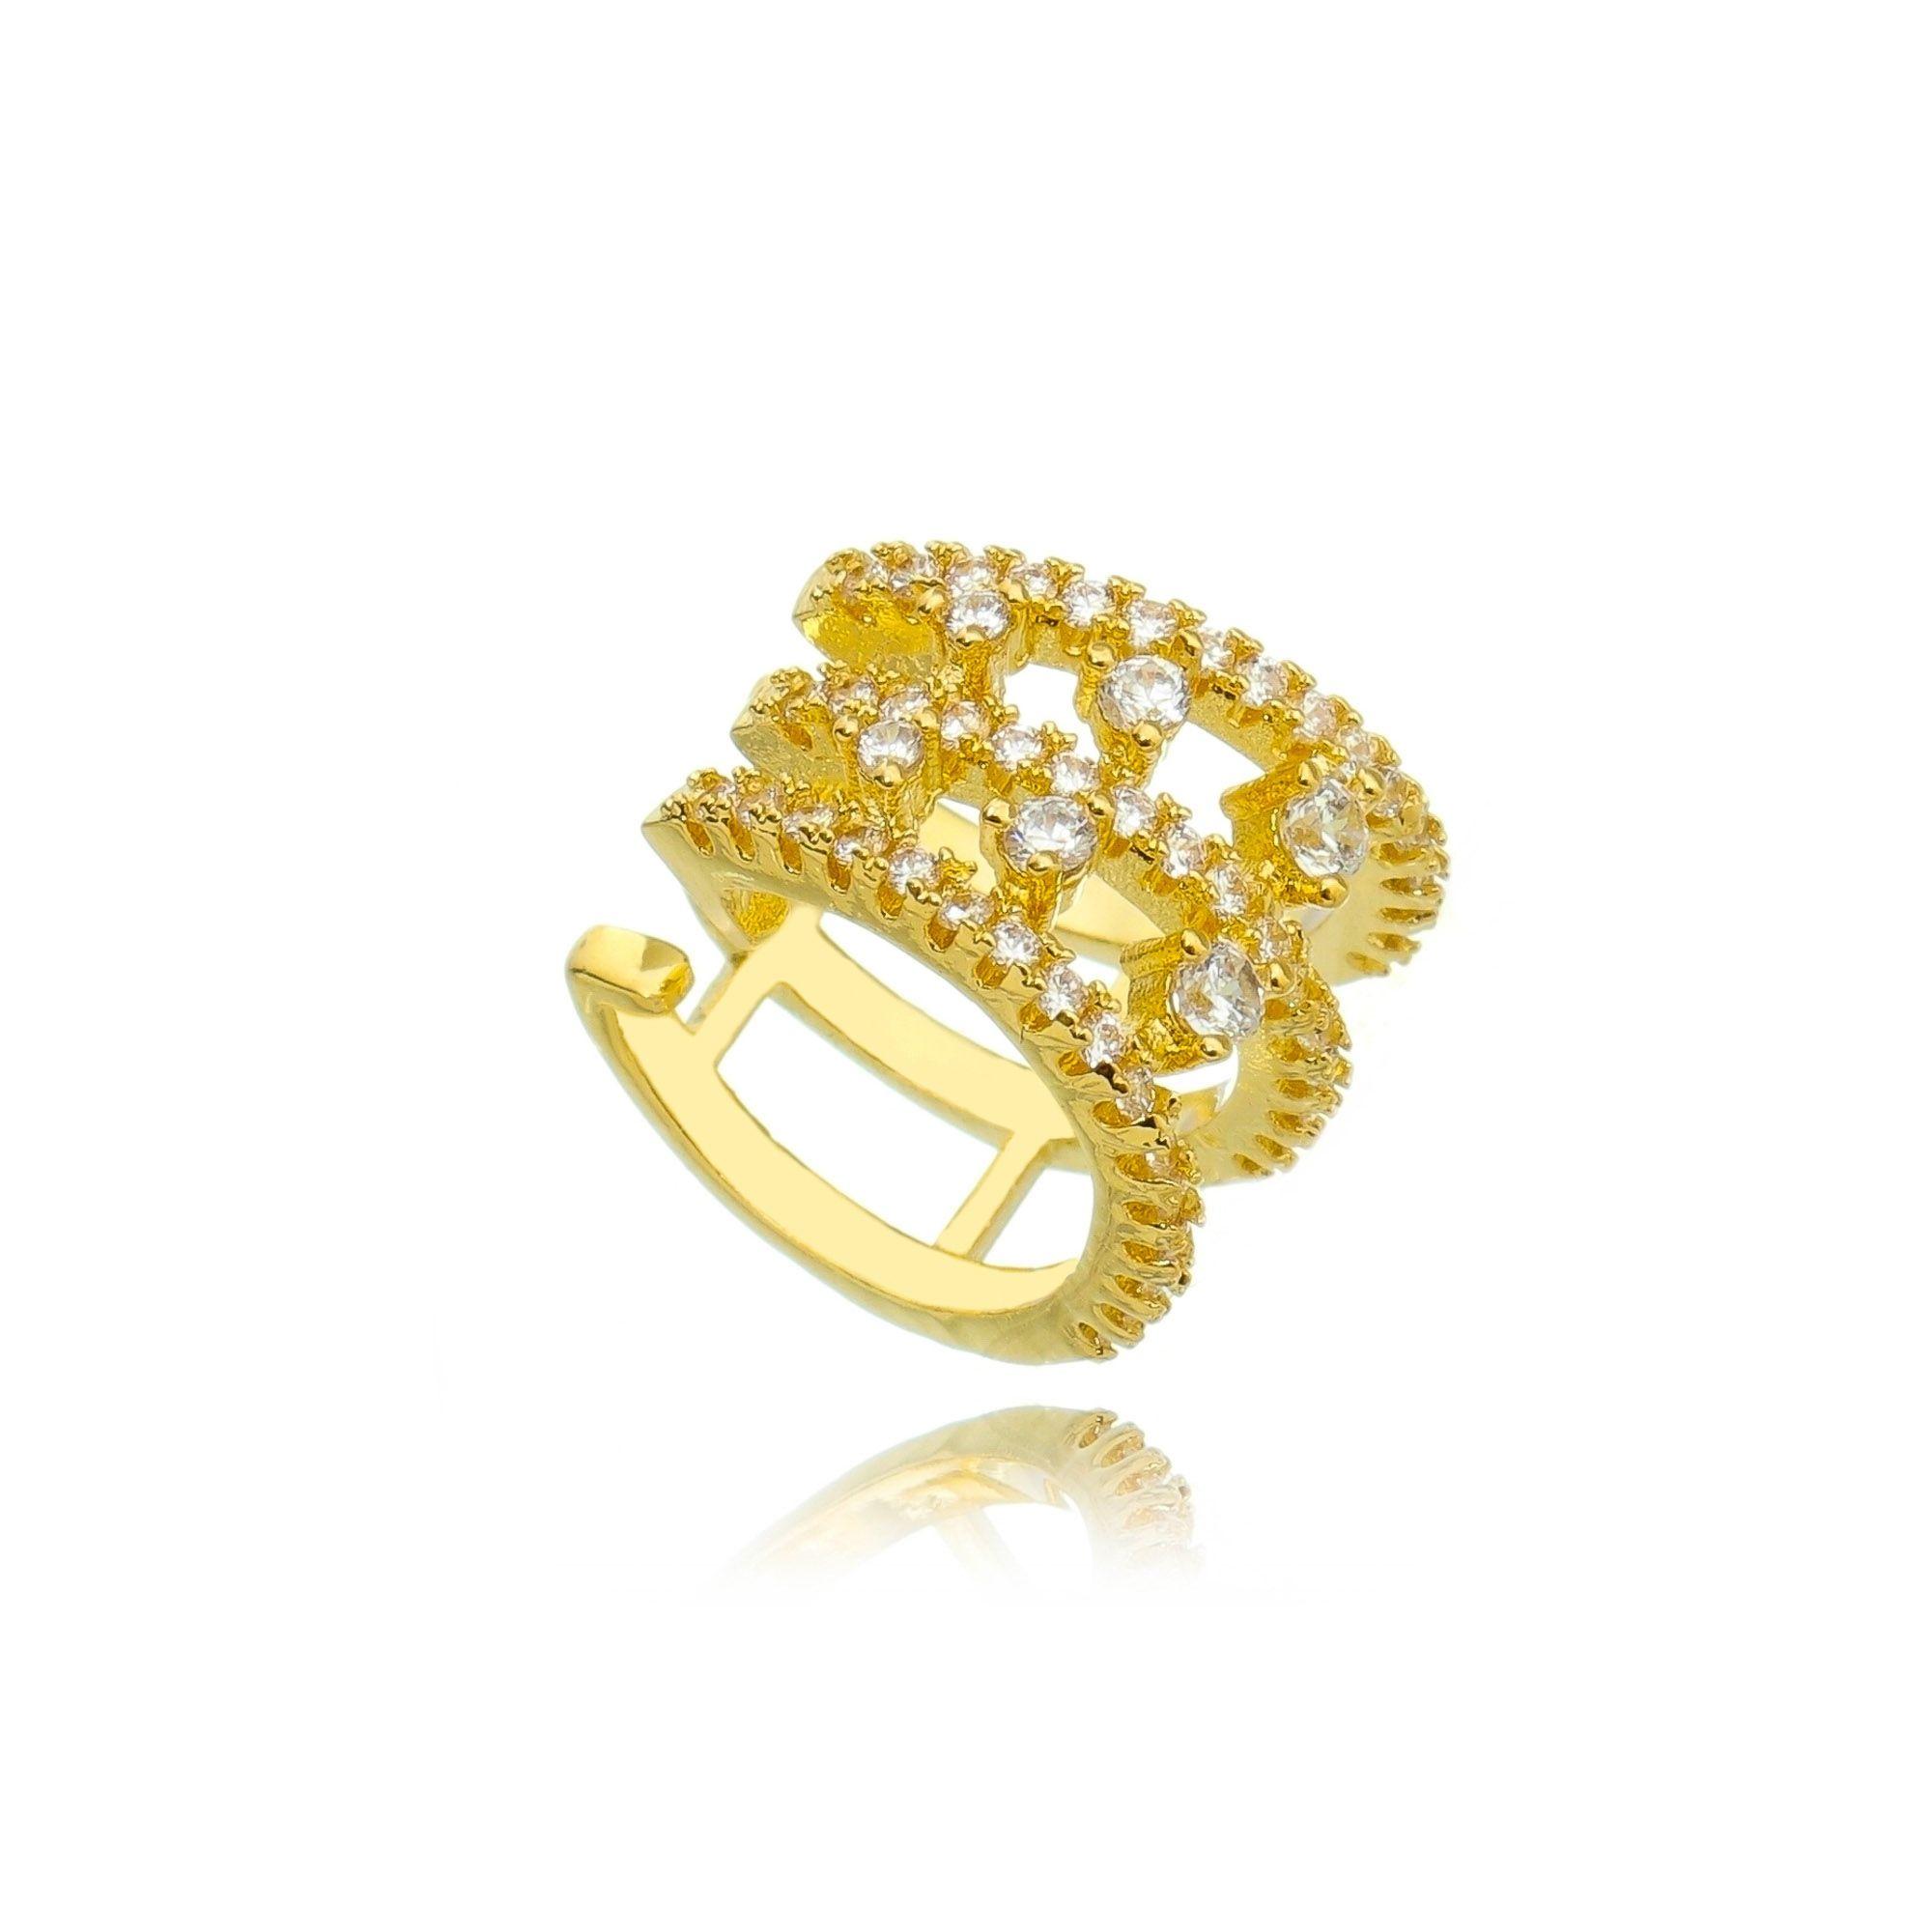 Piercing Falso Dourado com Zircônia Cristal Semijoia Fina Ouro  - Soloyou